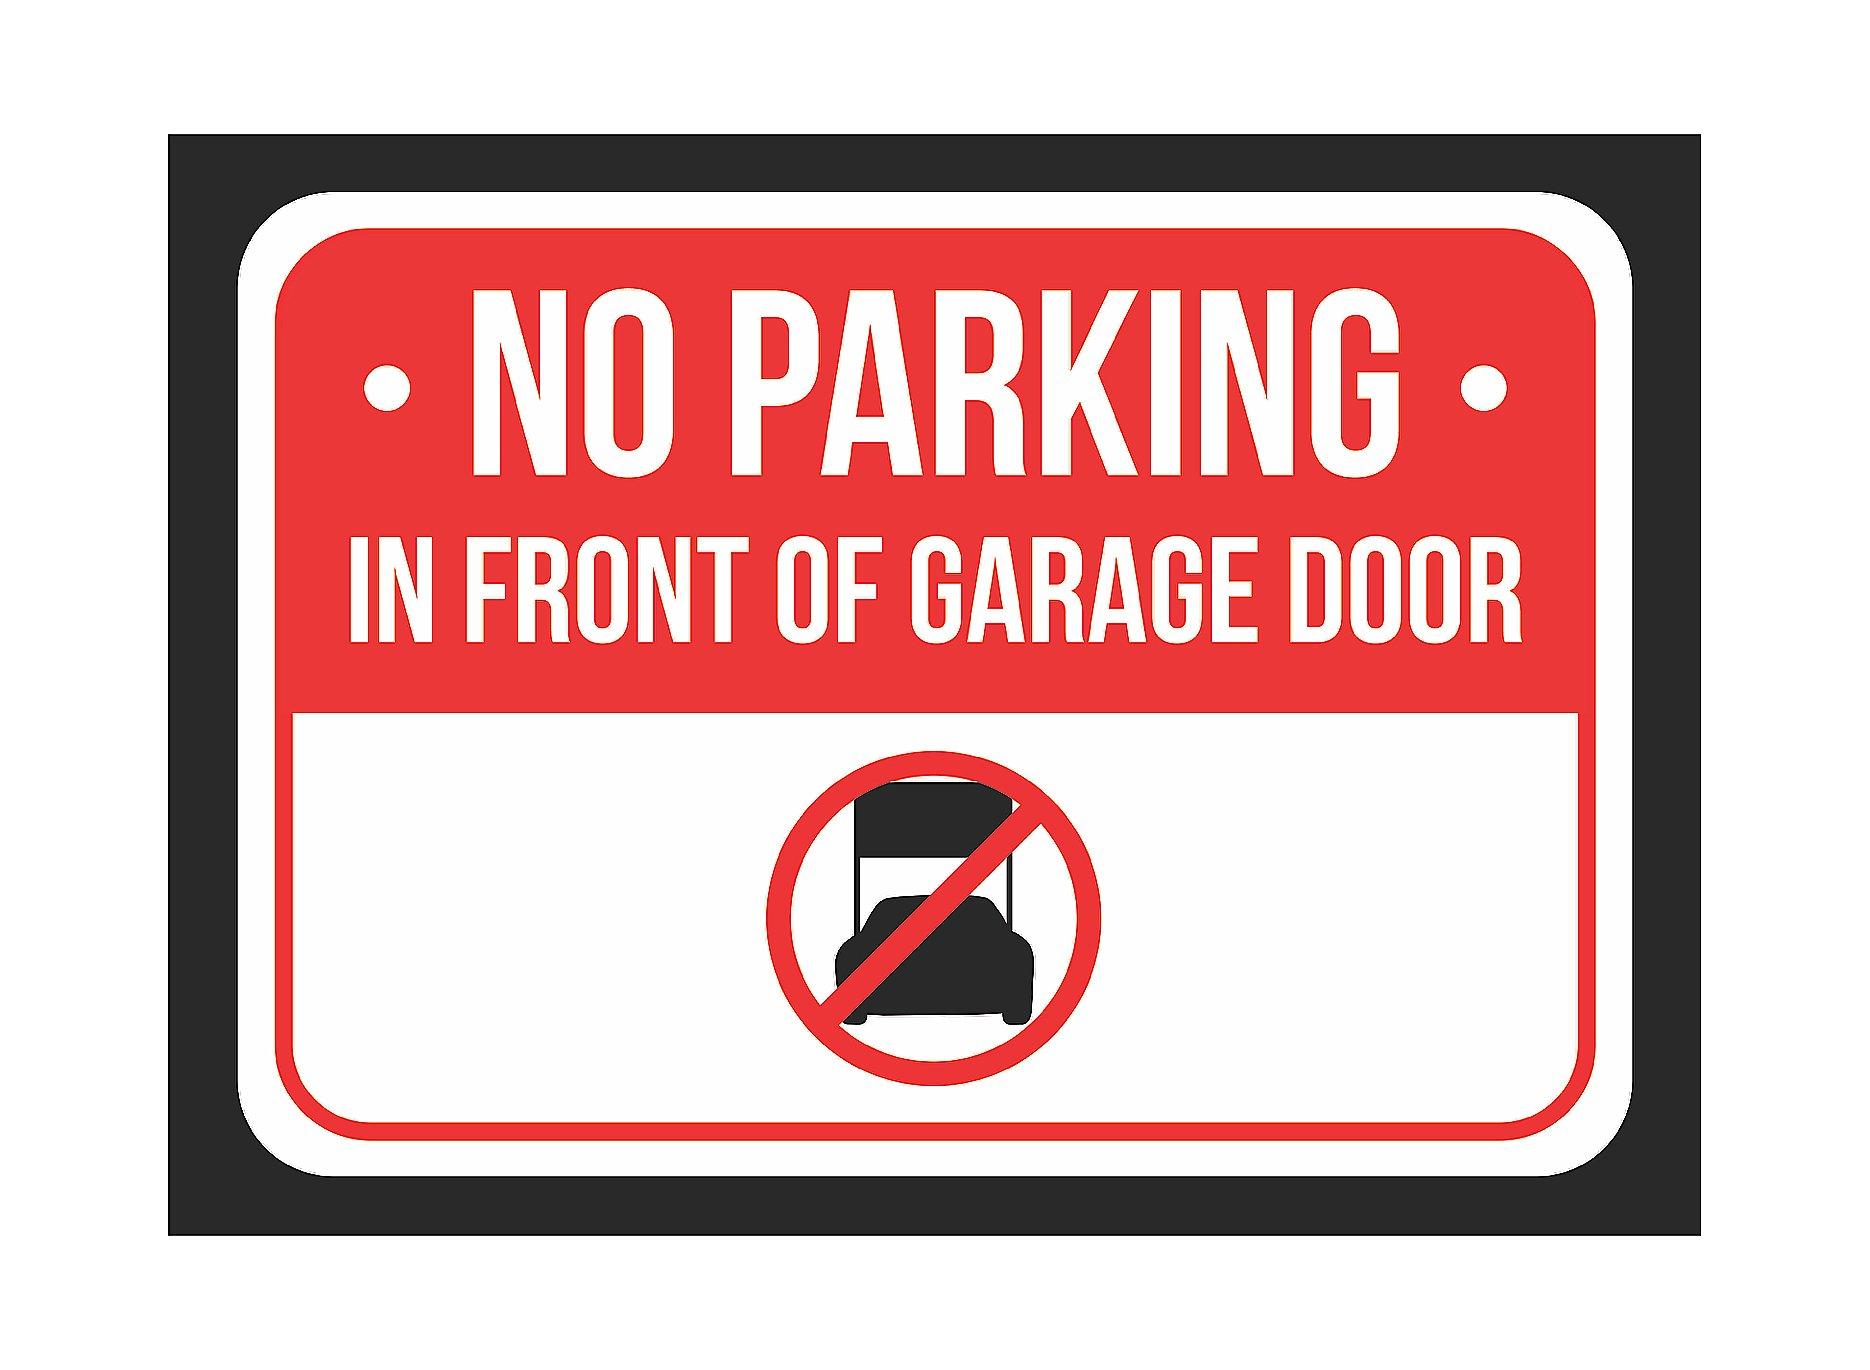 No Parking Do Not Block Garage Door Tow Zone 12x18 Aluminum Sign Made in USA UV